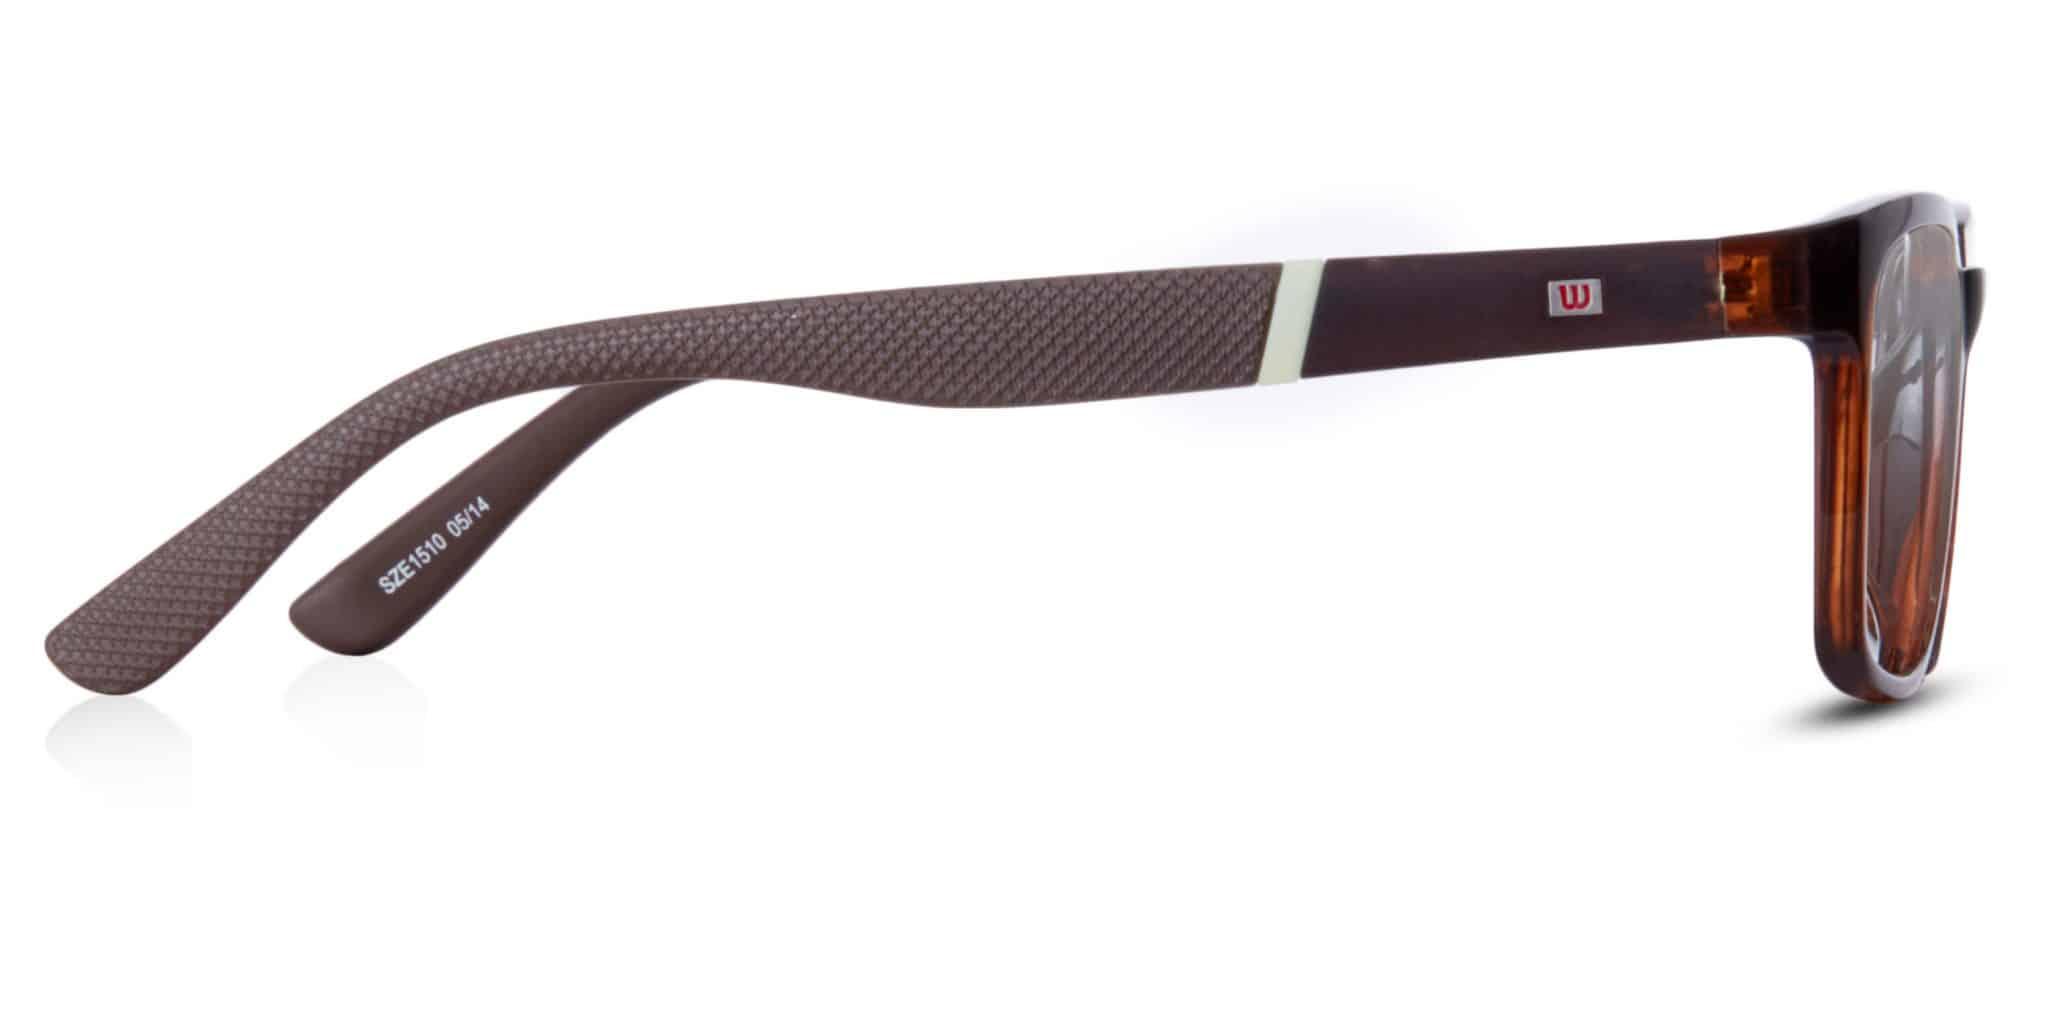 Wilson משקפי פלסטיק ספורטיביים